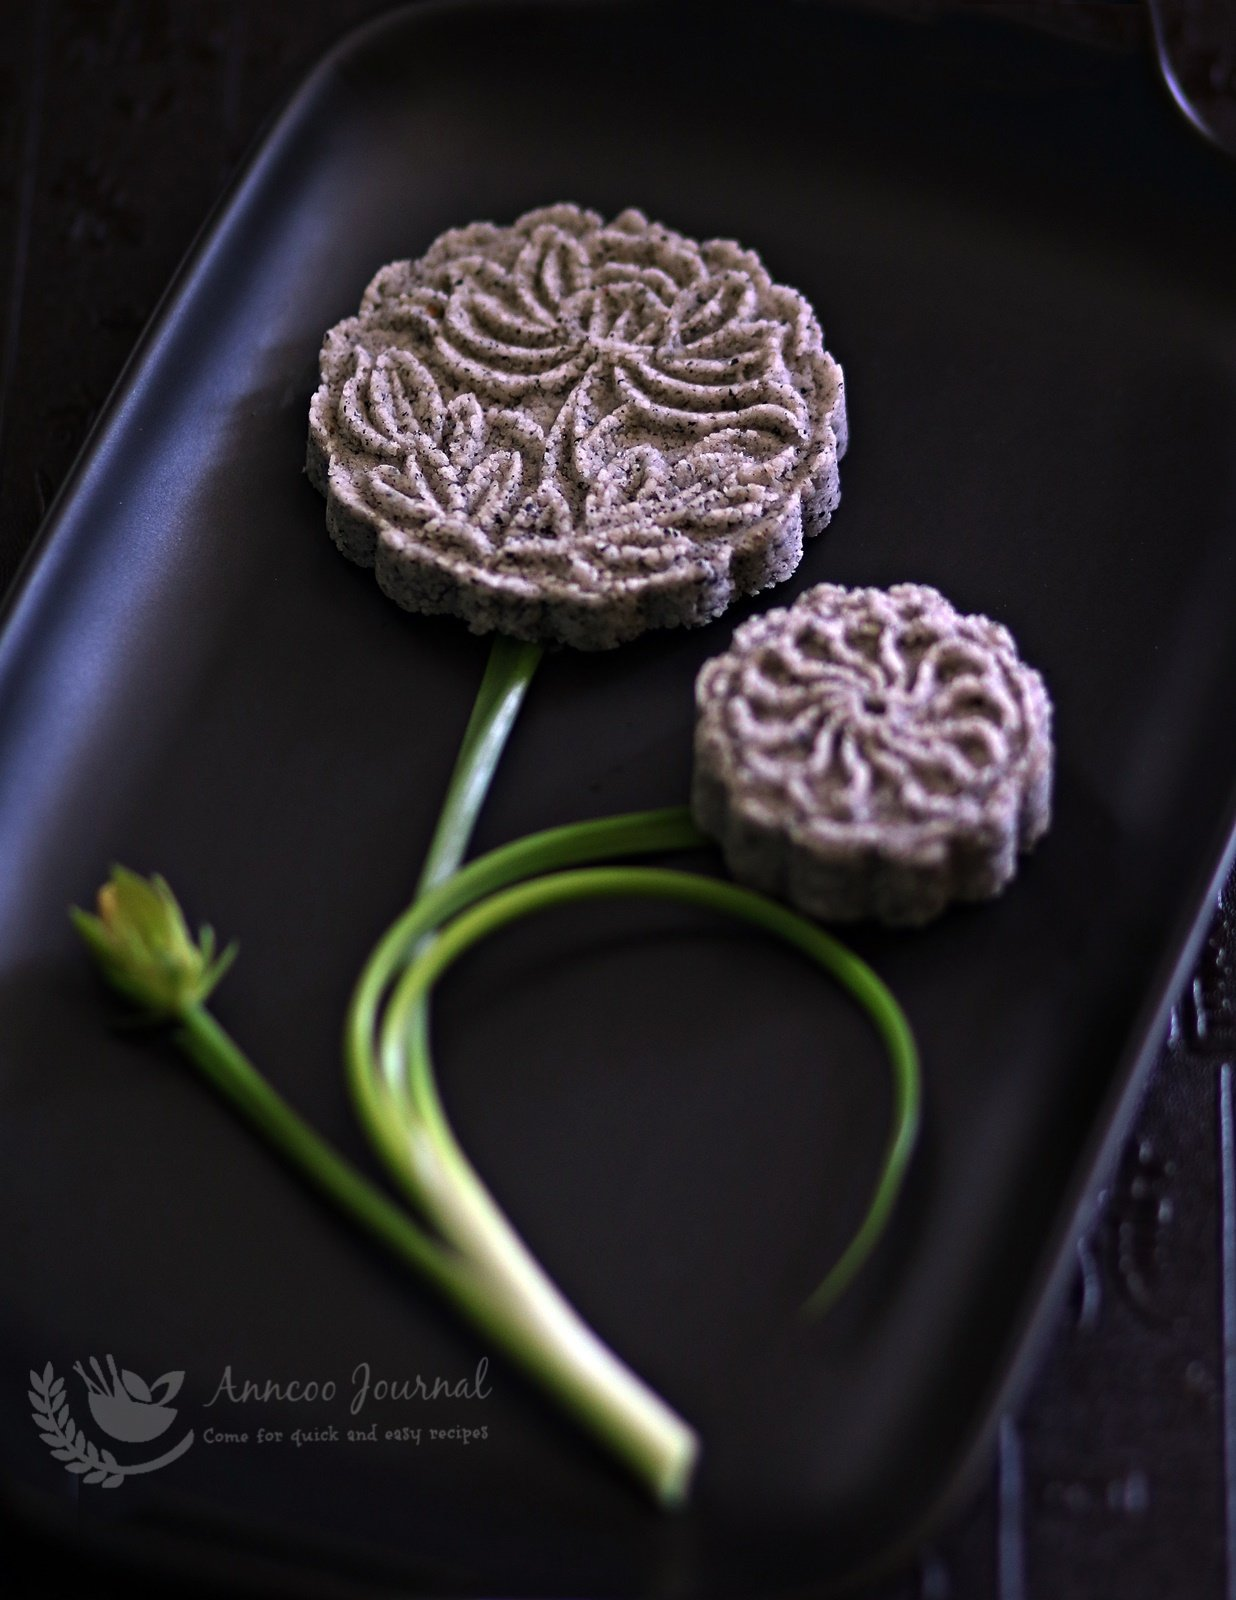 black sesame biscuits